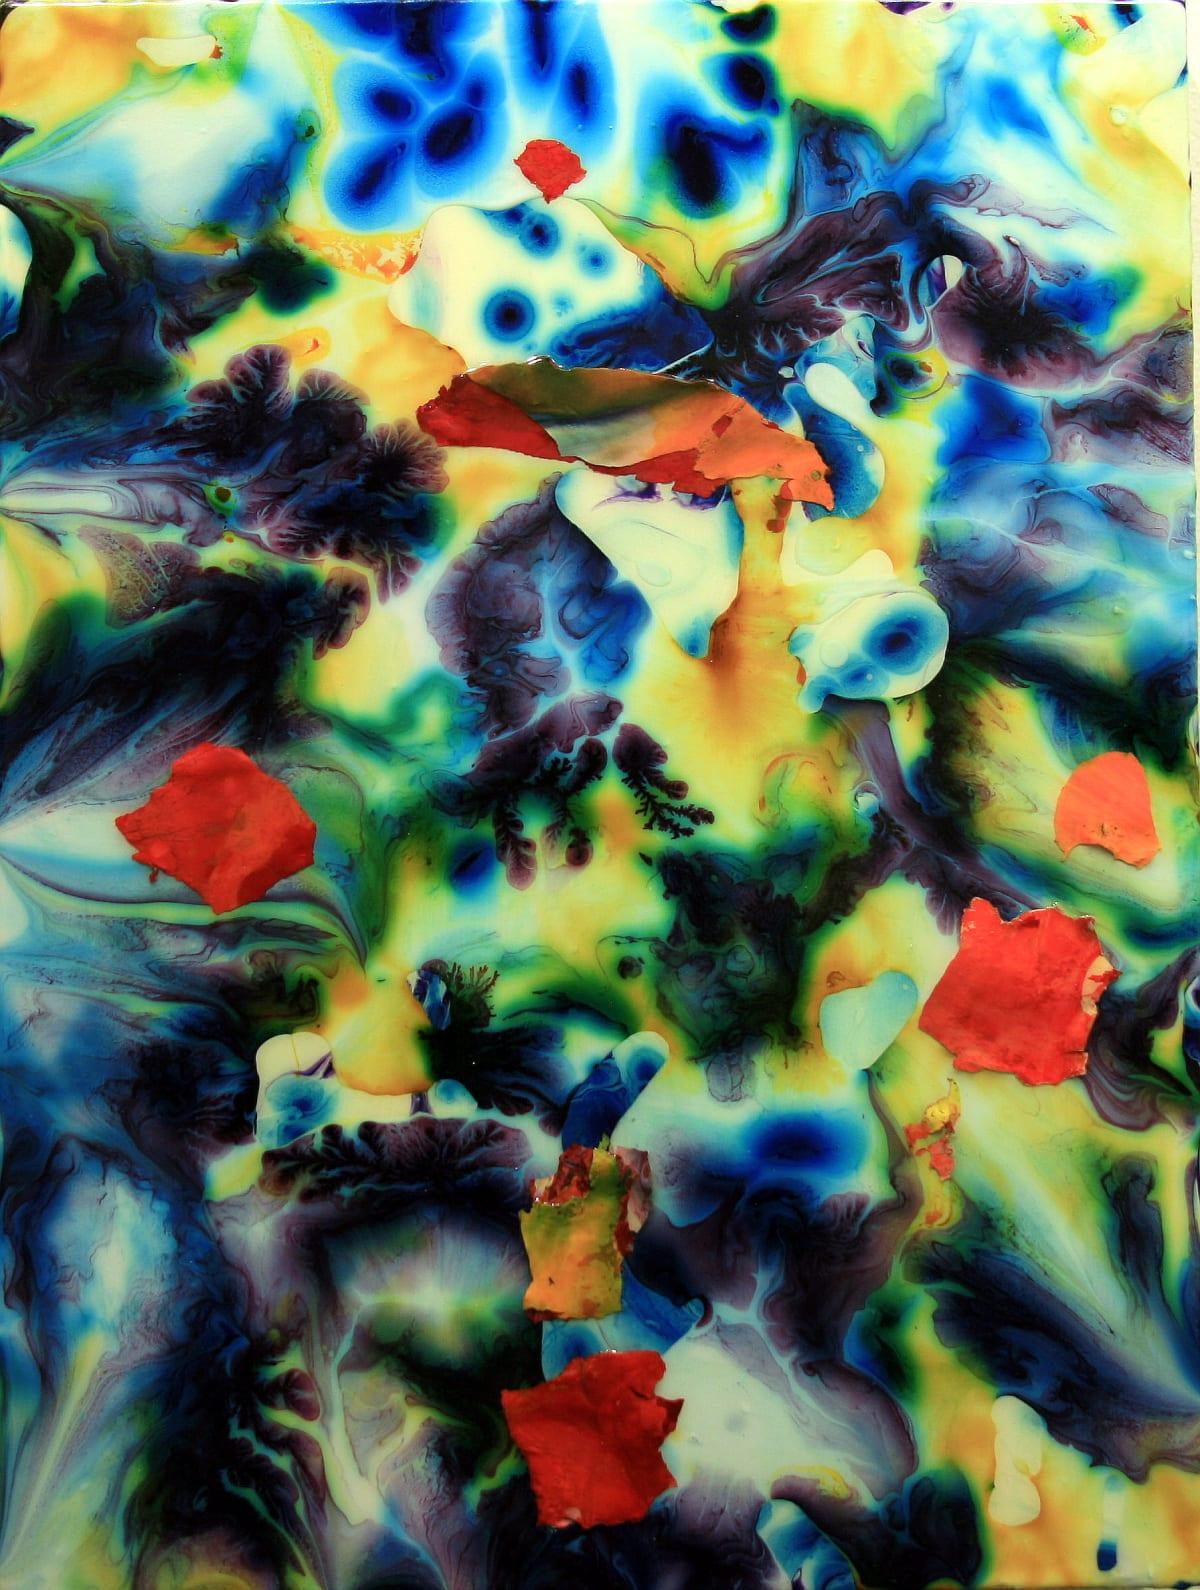 "John Koehler Untitled I Mixed media on panel 18"" x 24"" unframed 19.75 x 25.75"" framed"